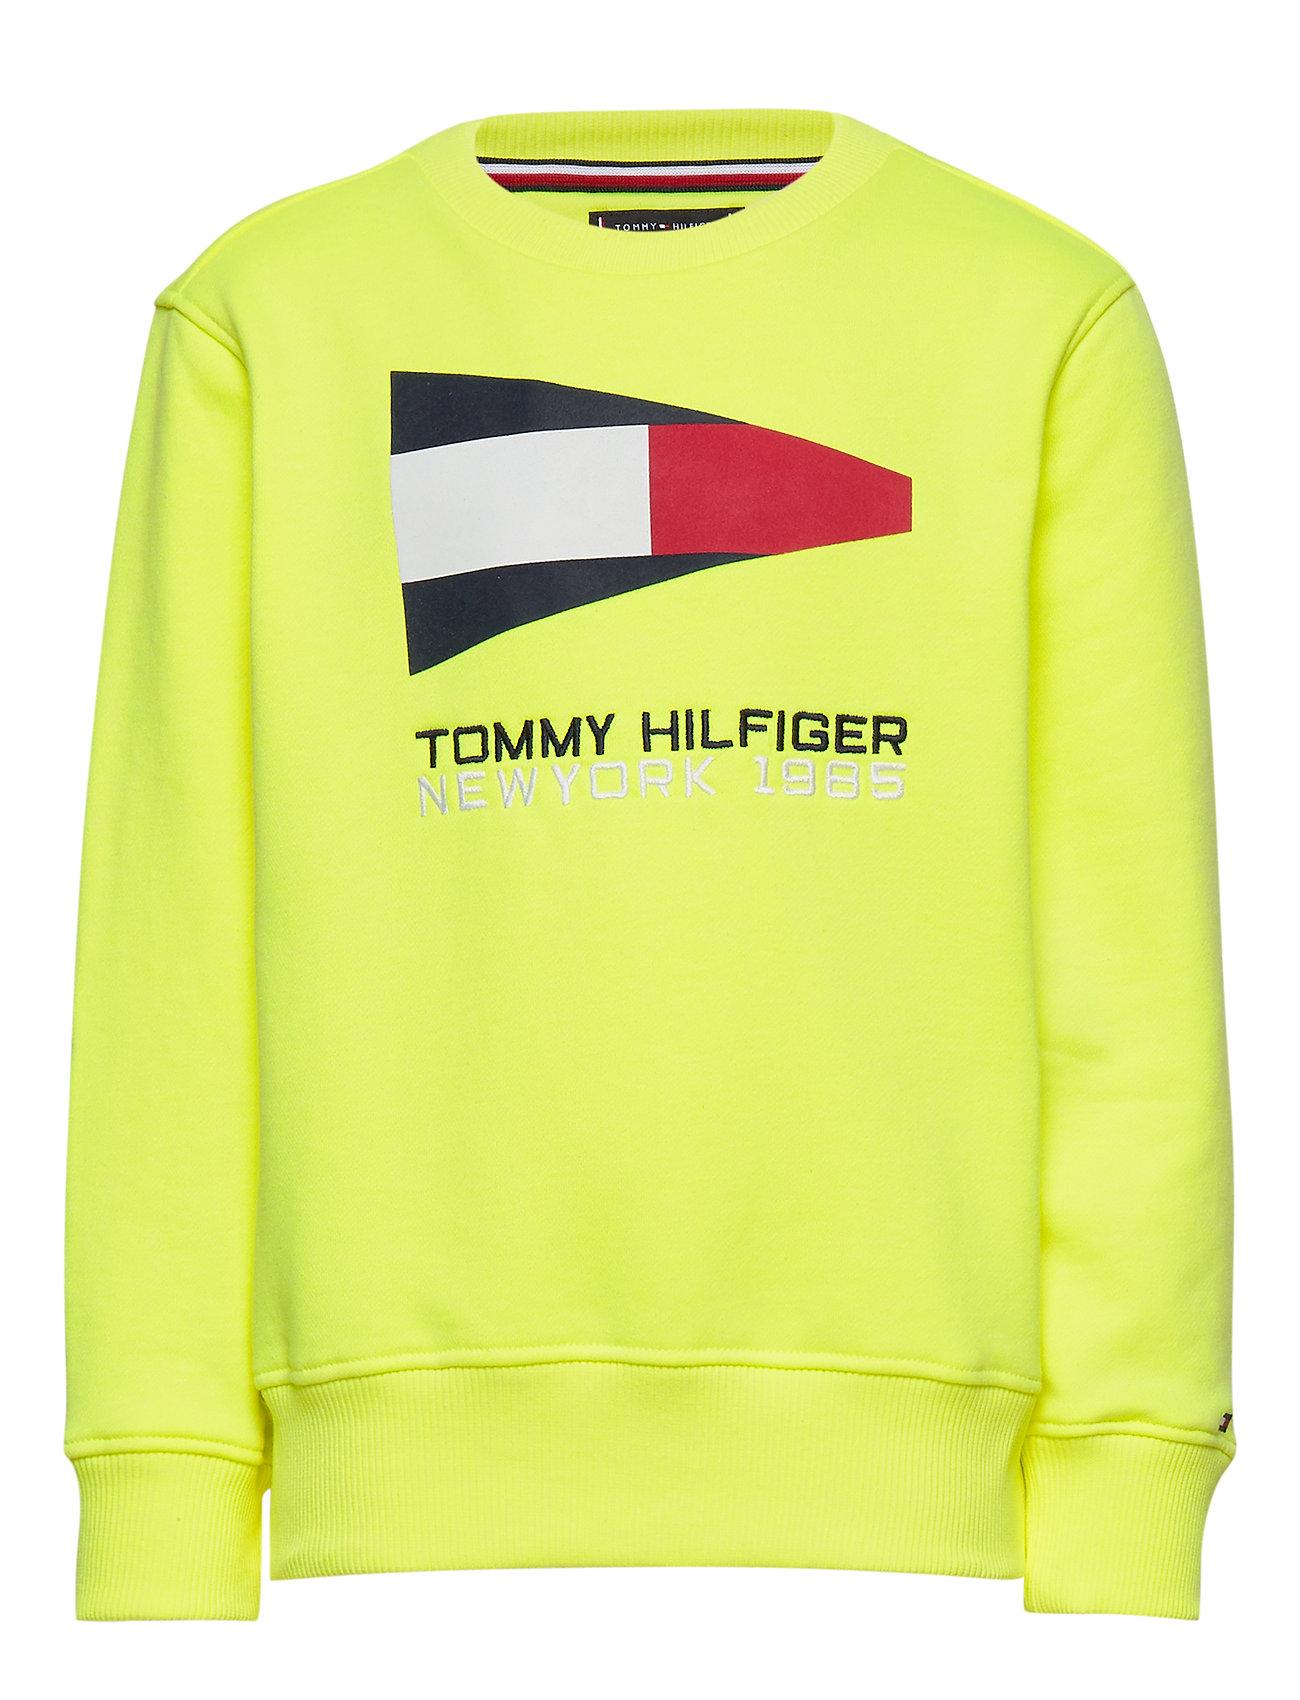 Tommy Hilfiger SAILING FLAG GRAPHIC SWEATSHIRT - SAFETY YELLOW 13-0630